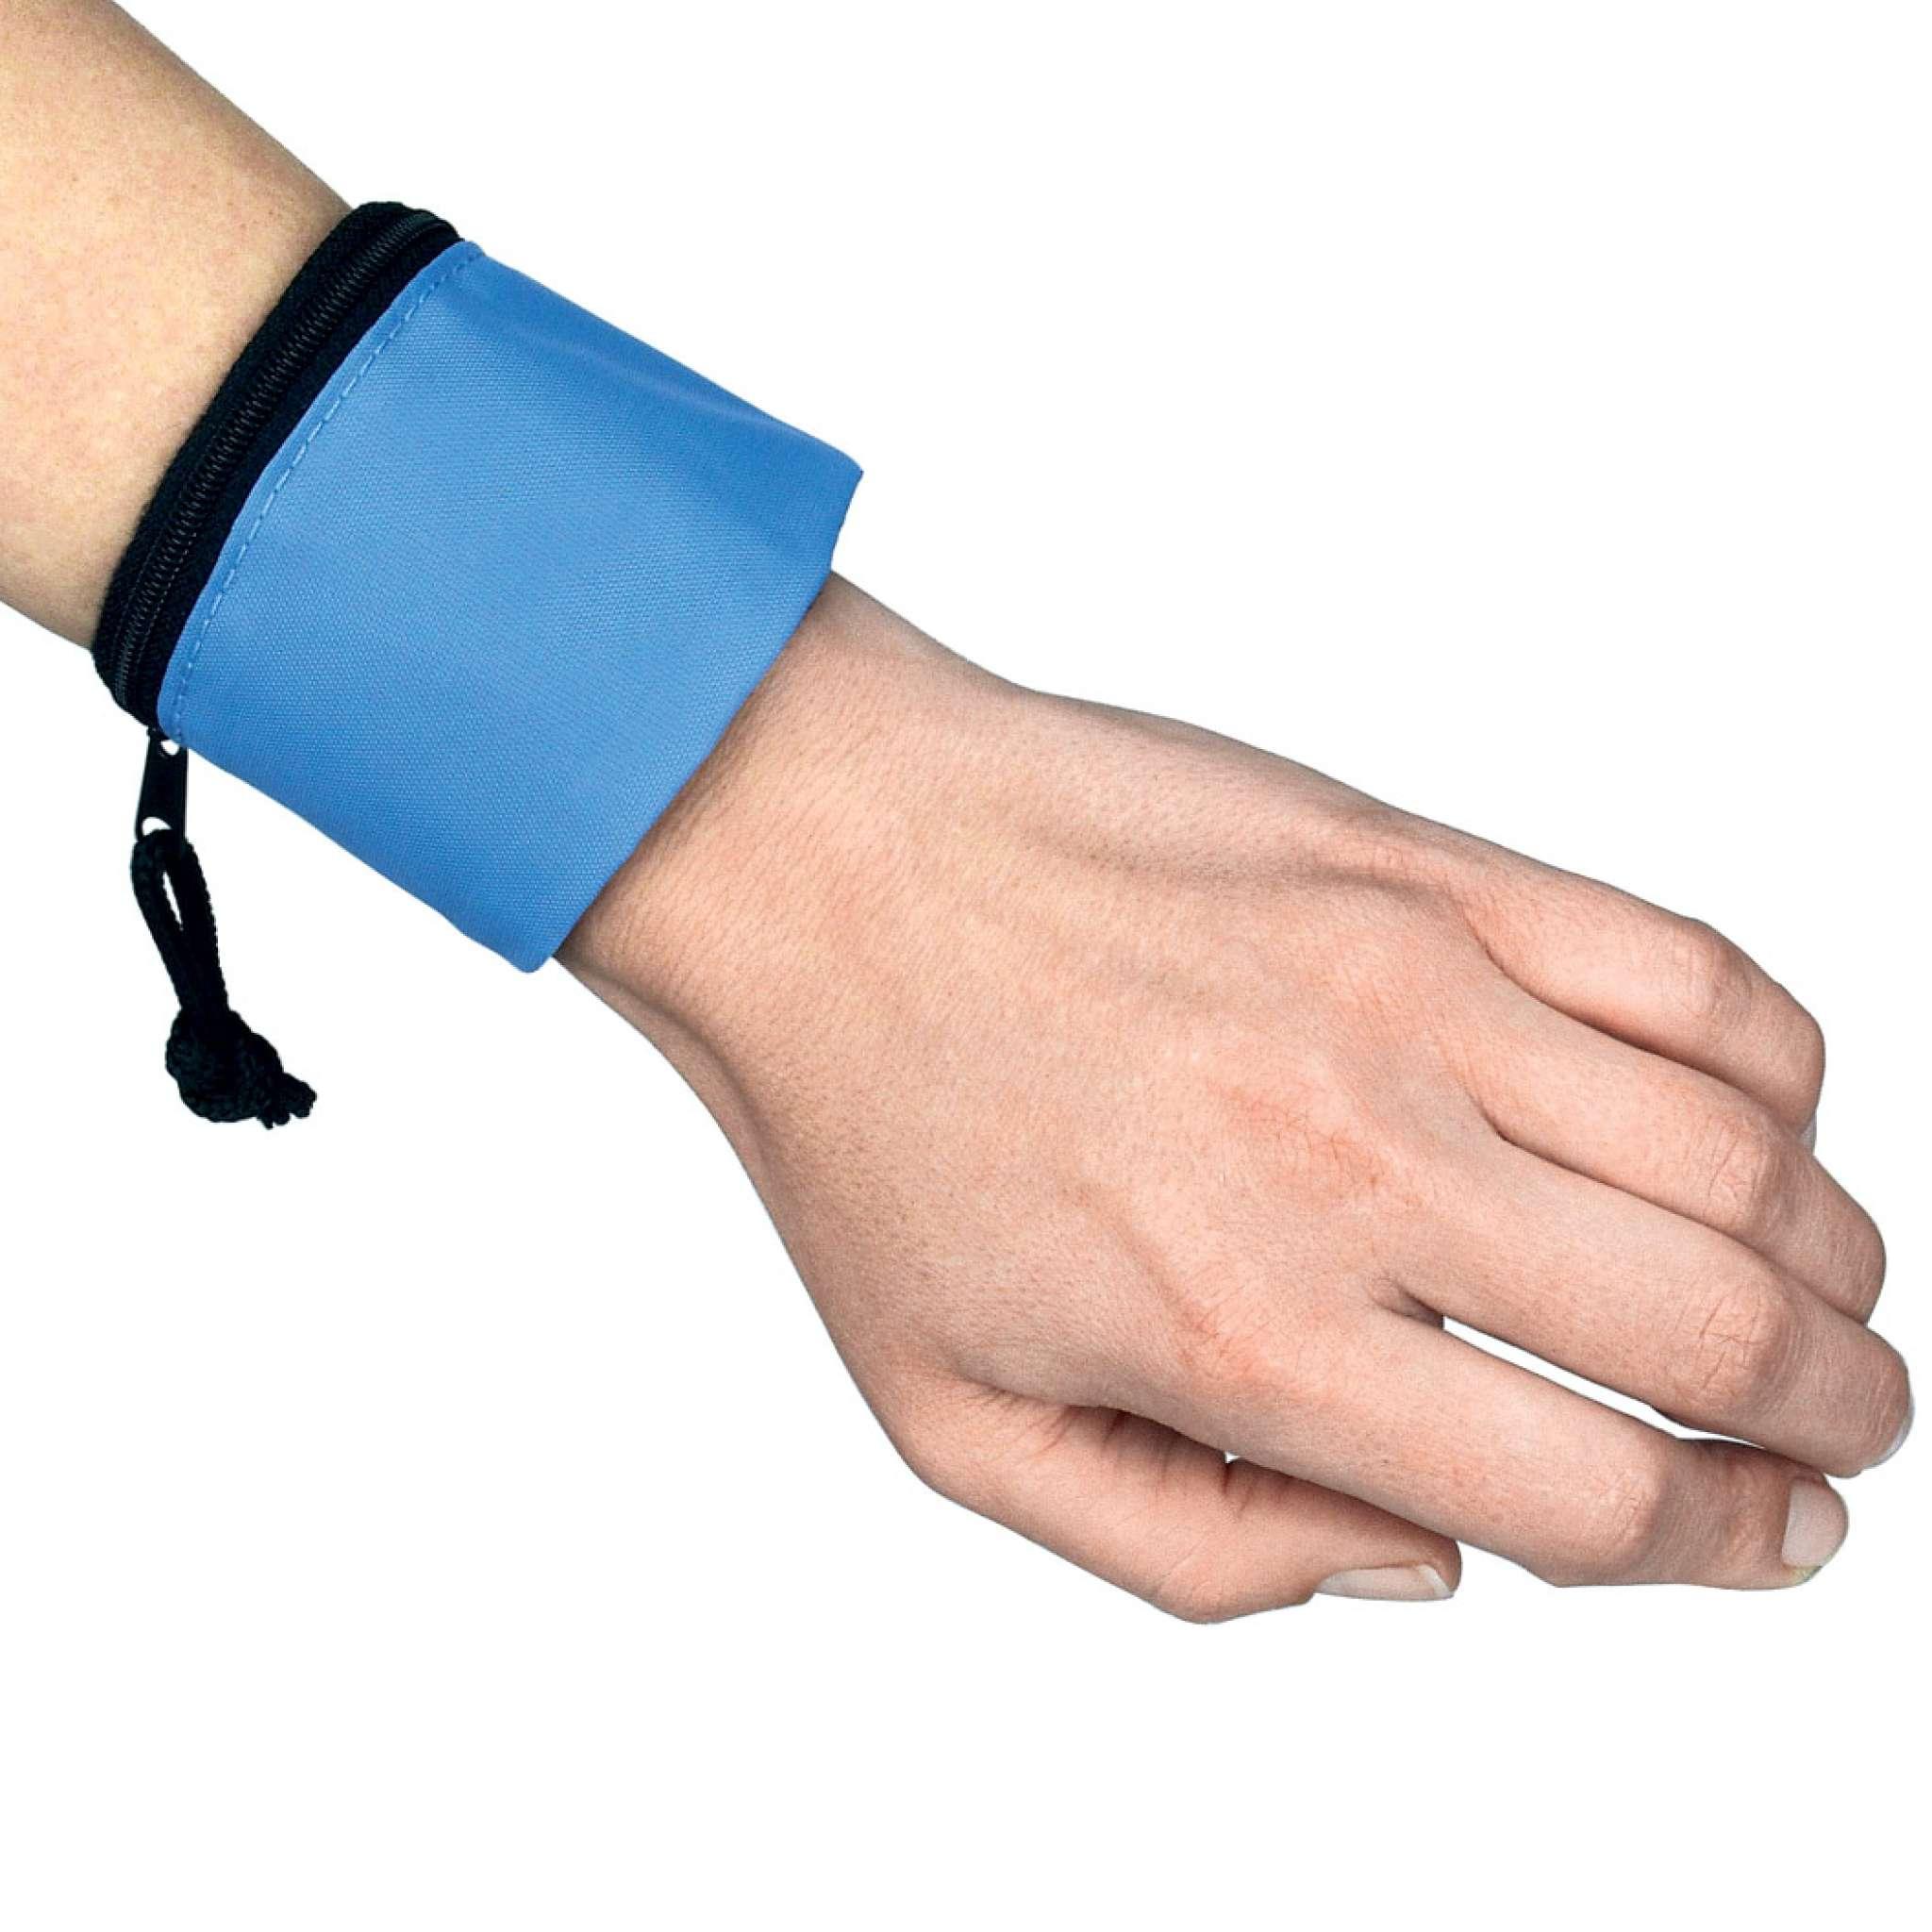 Bonusgave - gratis wrist wallet